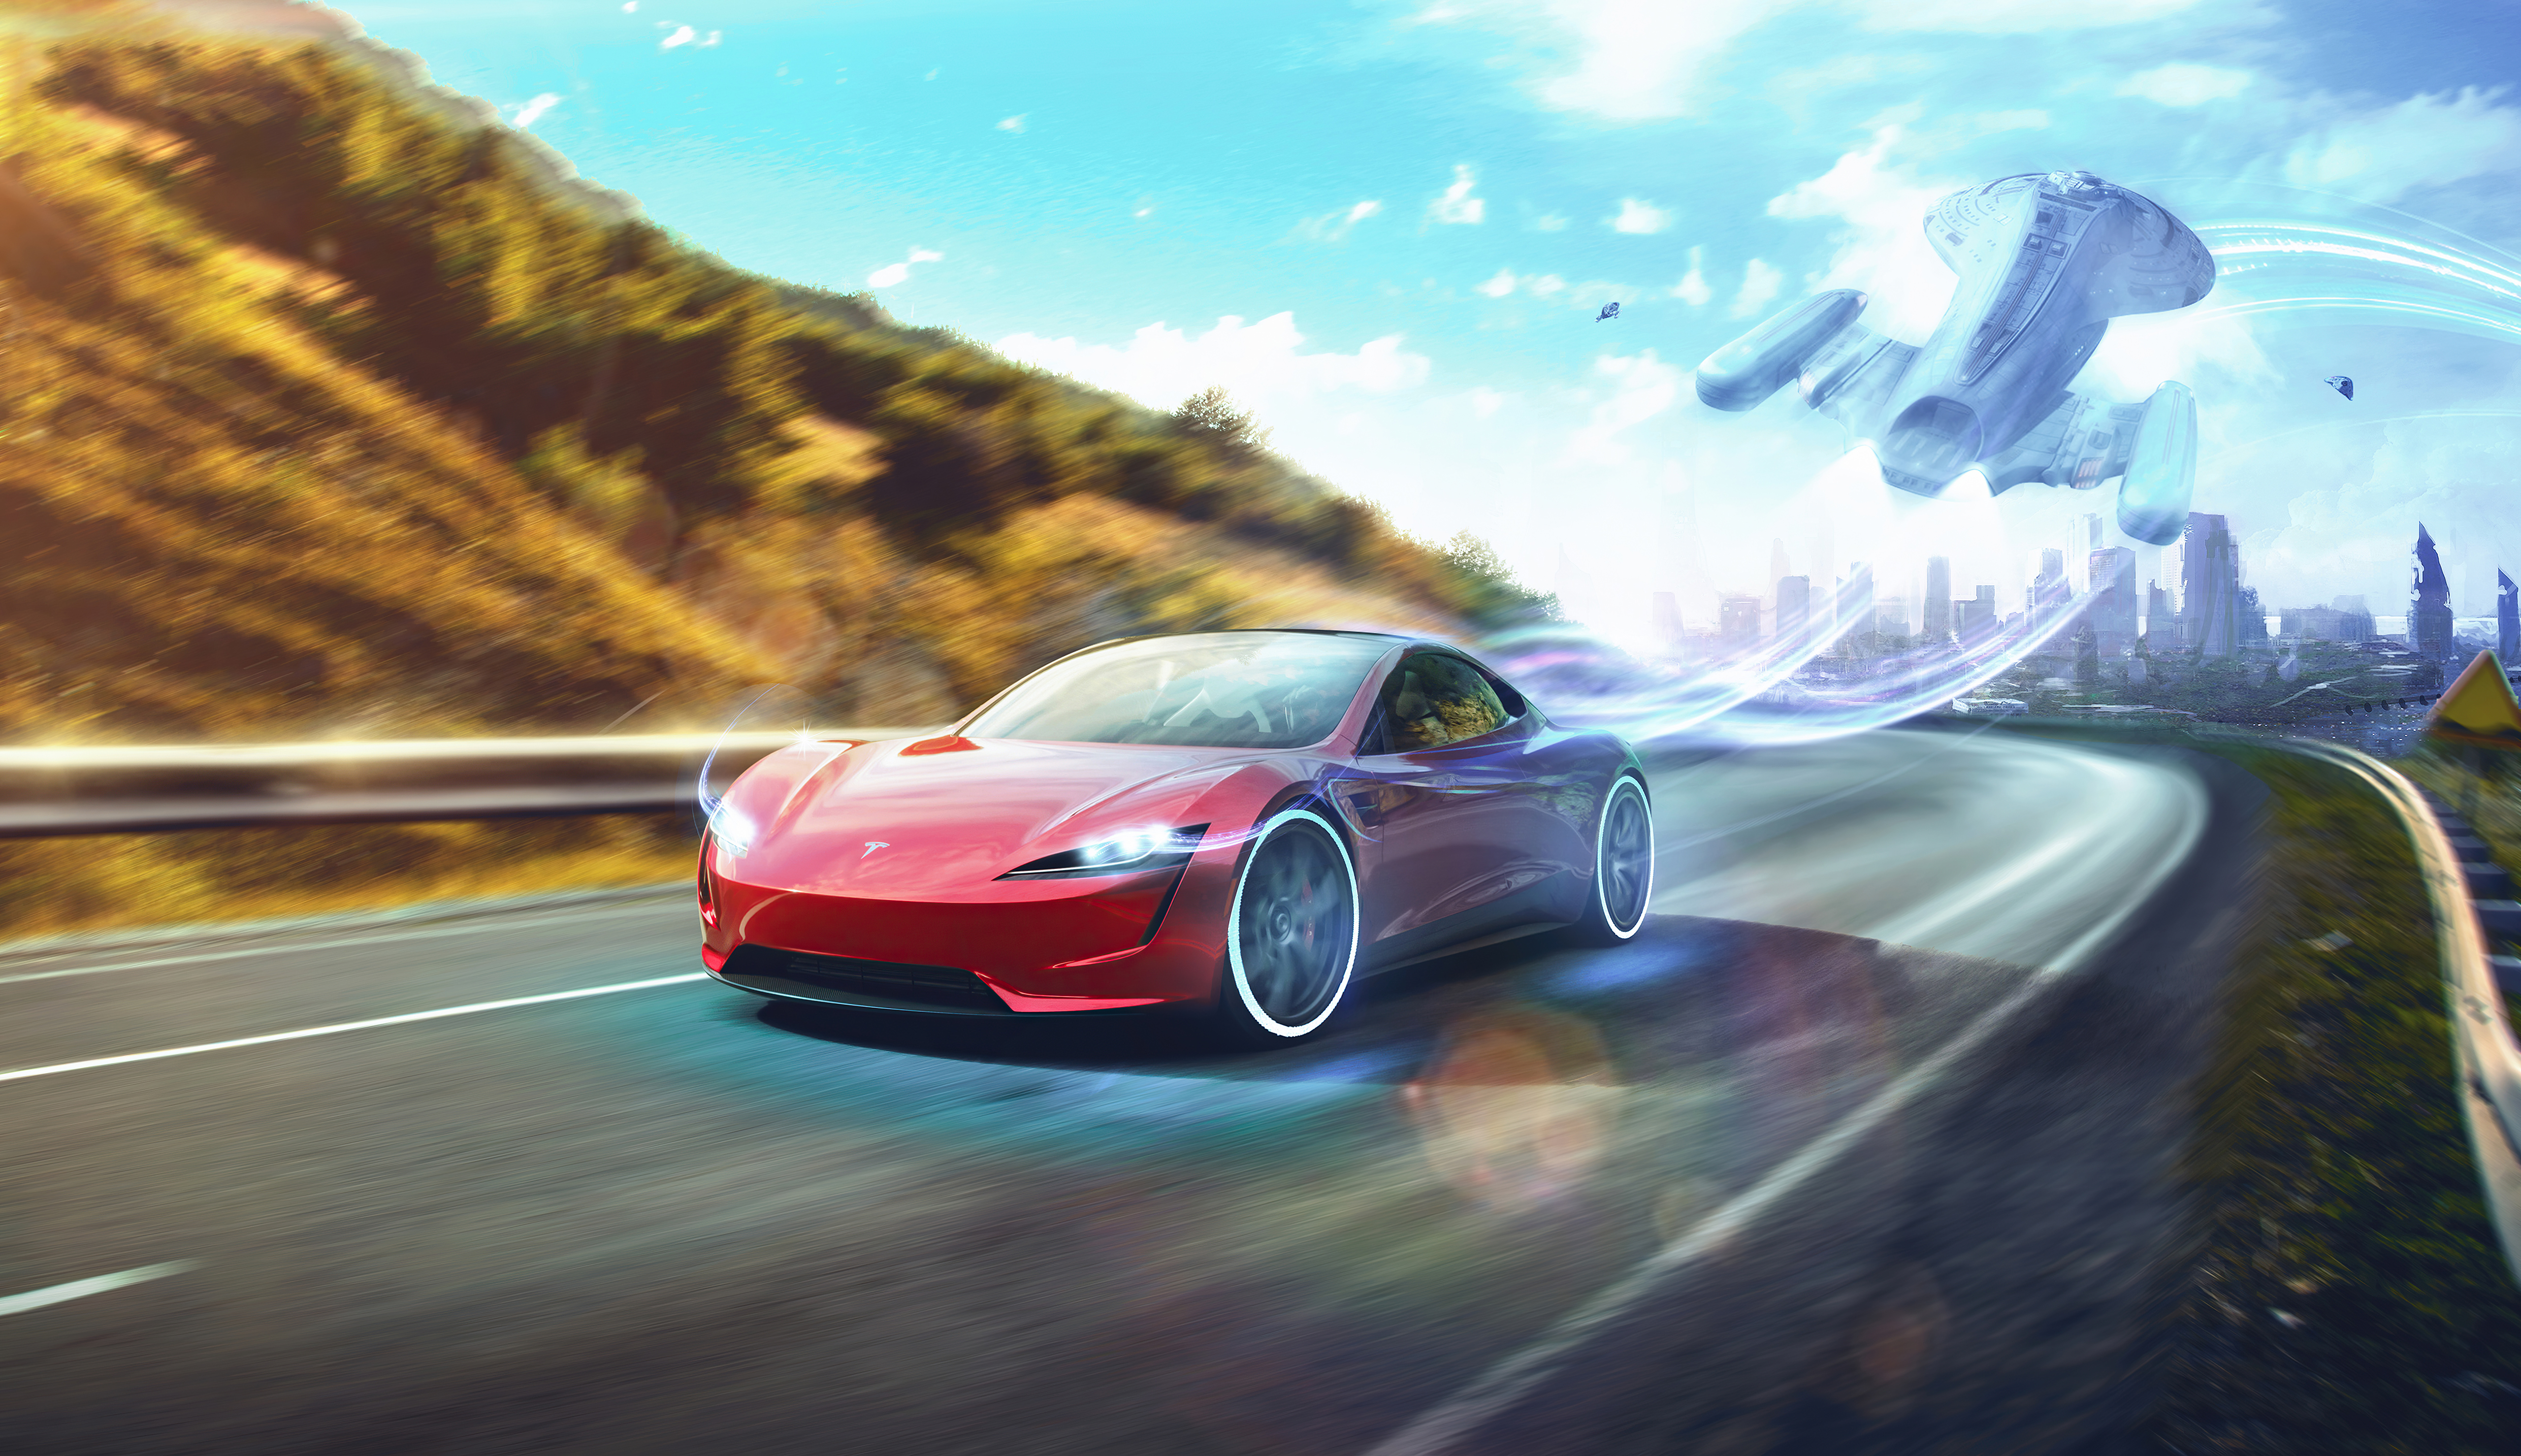 Wallpaper Tesla Roadster